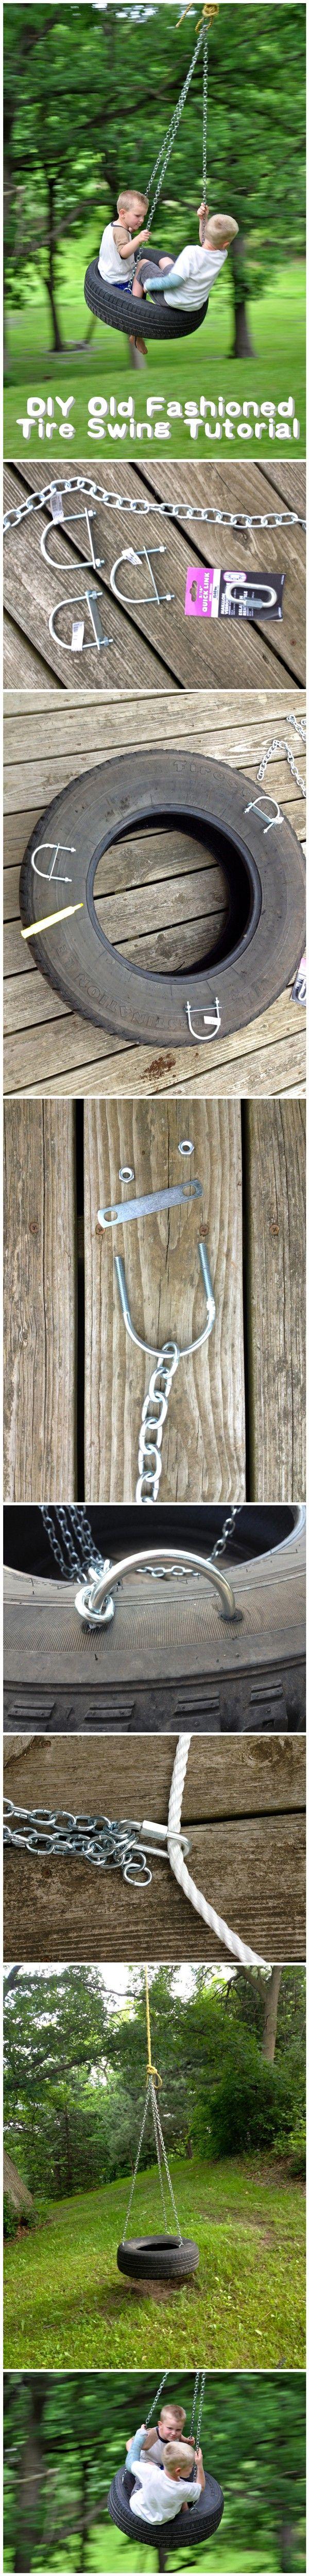 #DIY Old Fashioned #Tire #Swing #Tutorial